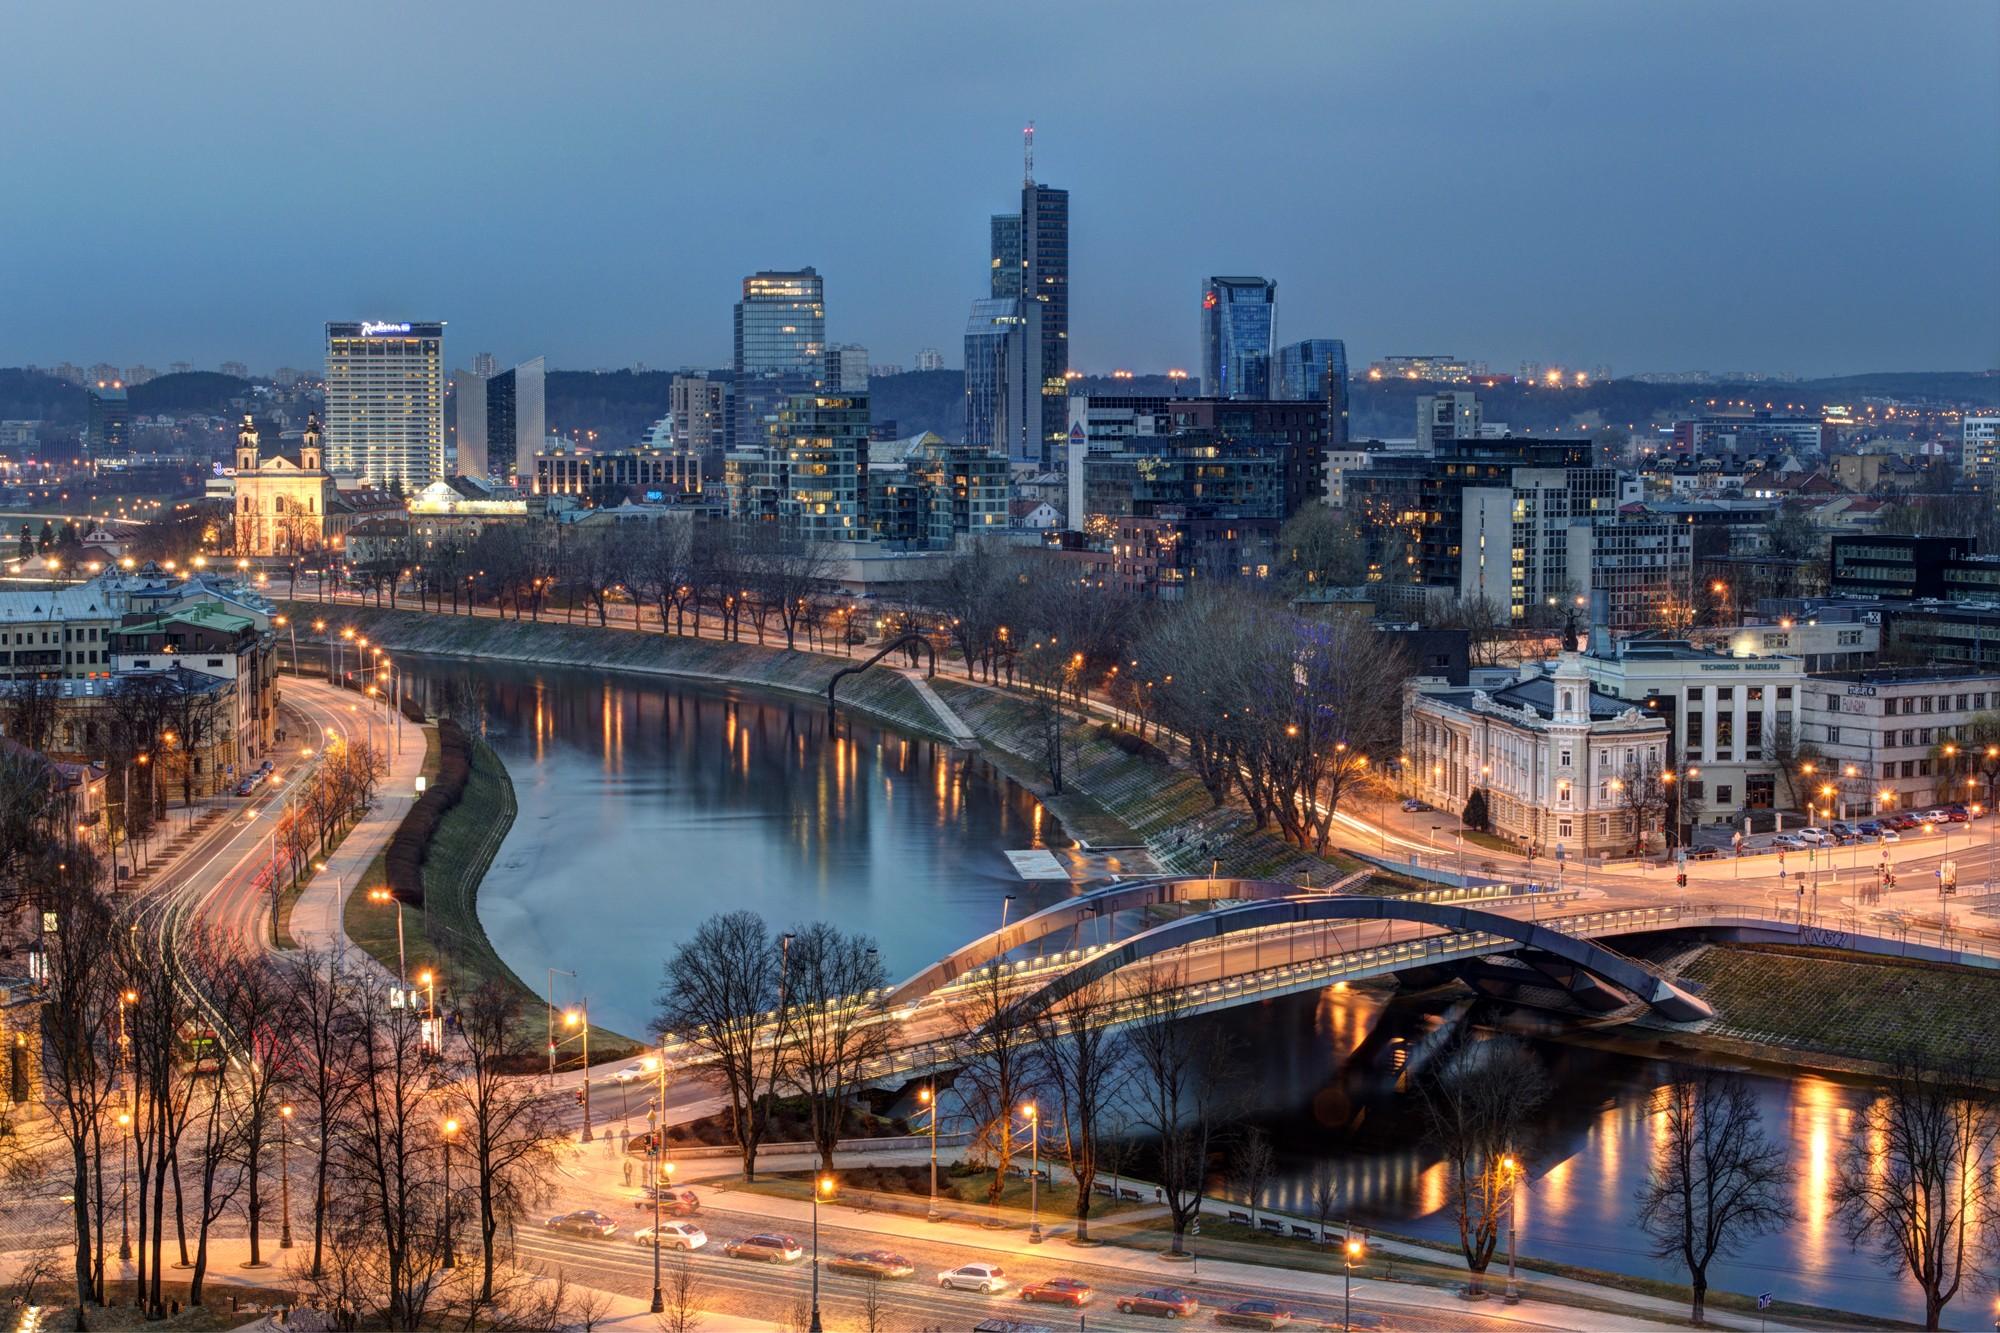 Еврокомиссия: Литва успешно перешла на евро - Цензор.НЕТ 8012